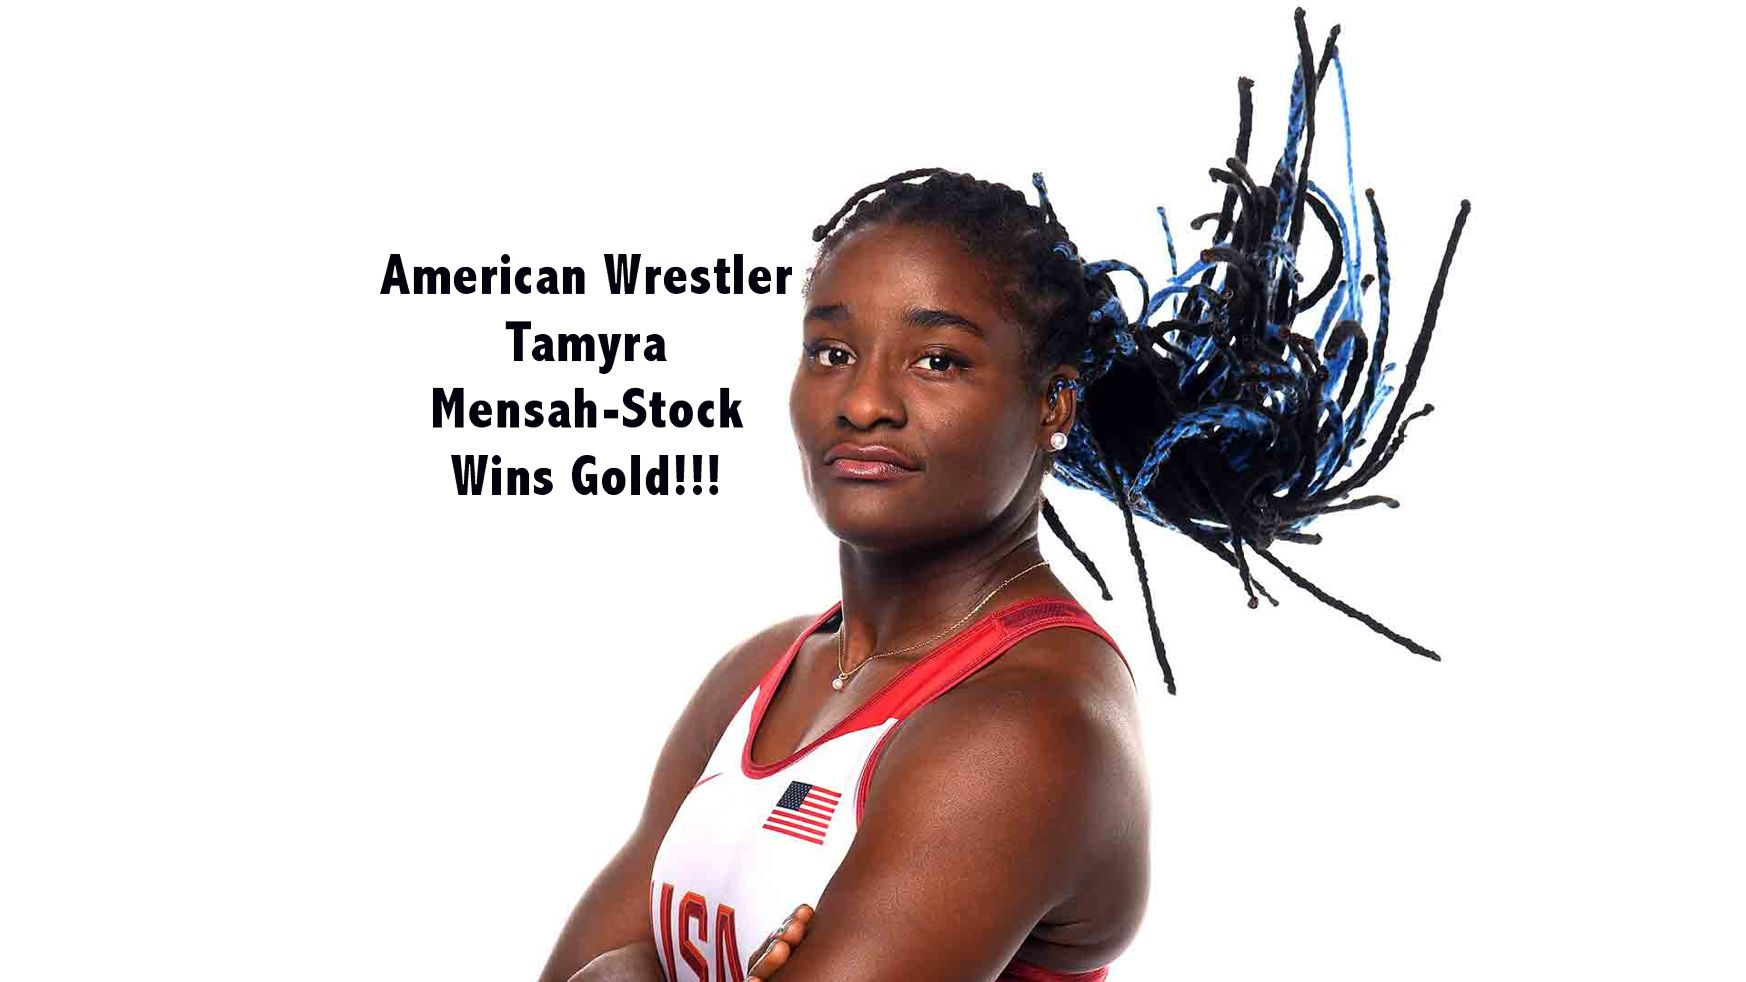 American Wrestler Tamyra Mensah-Stock Wins Gold!!!